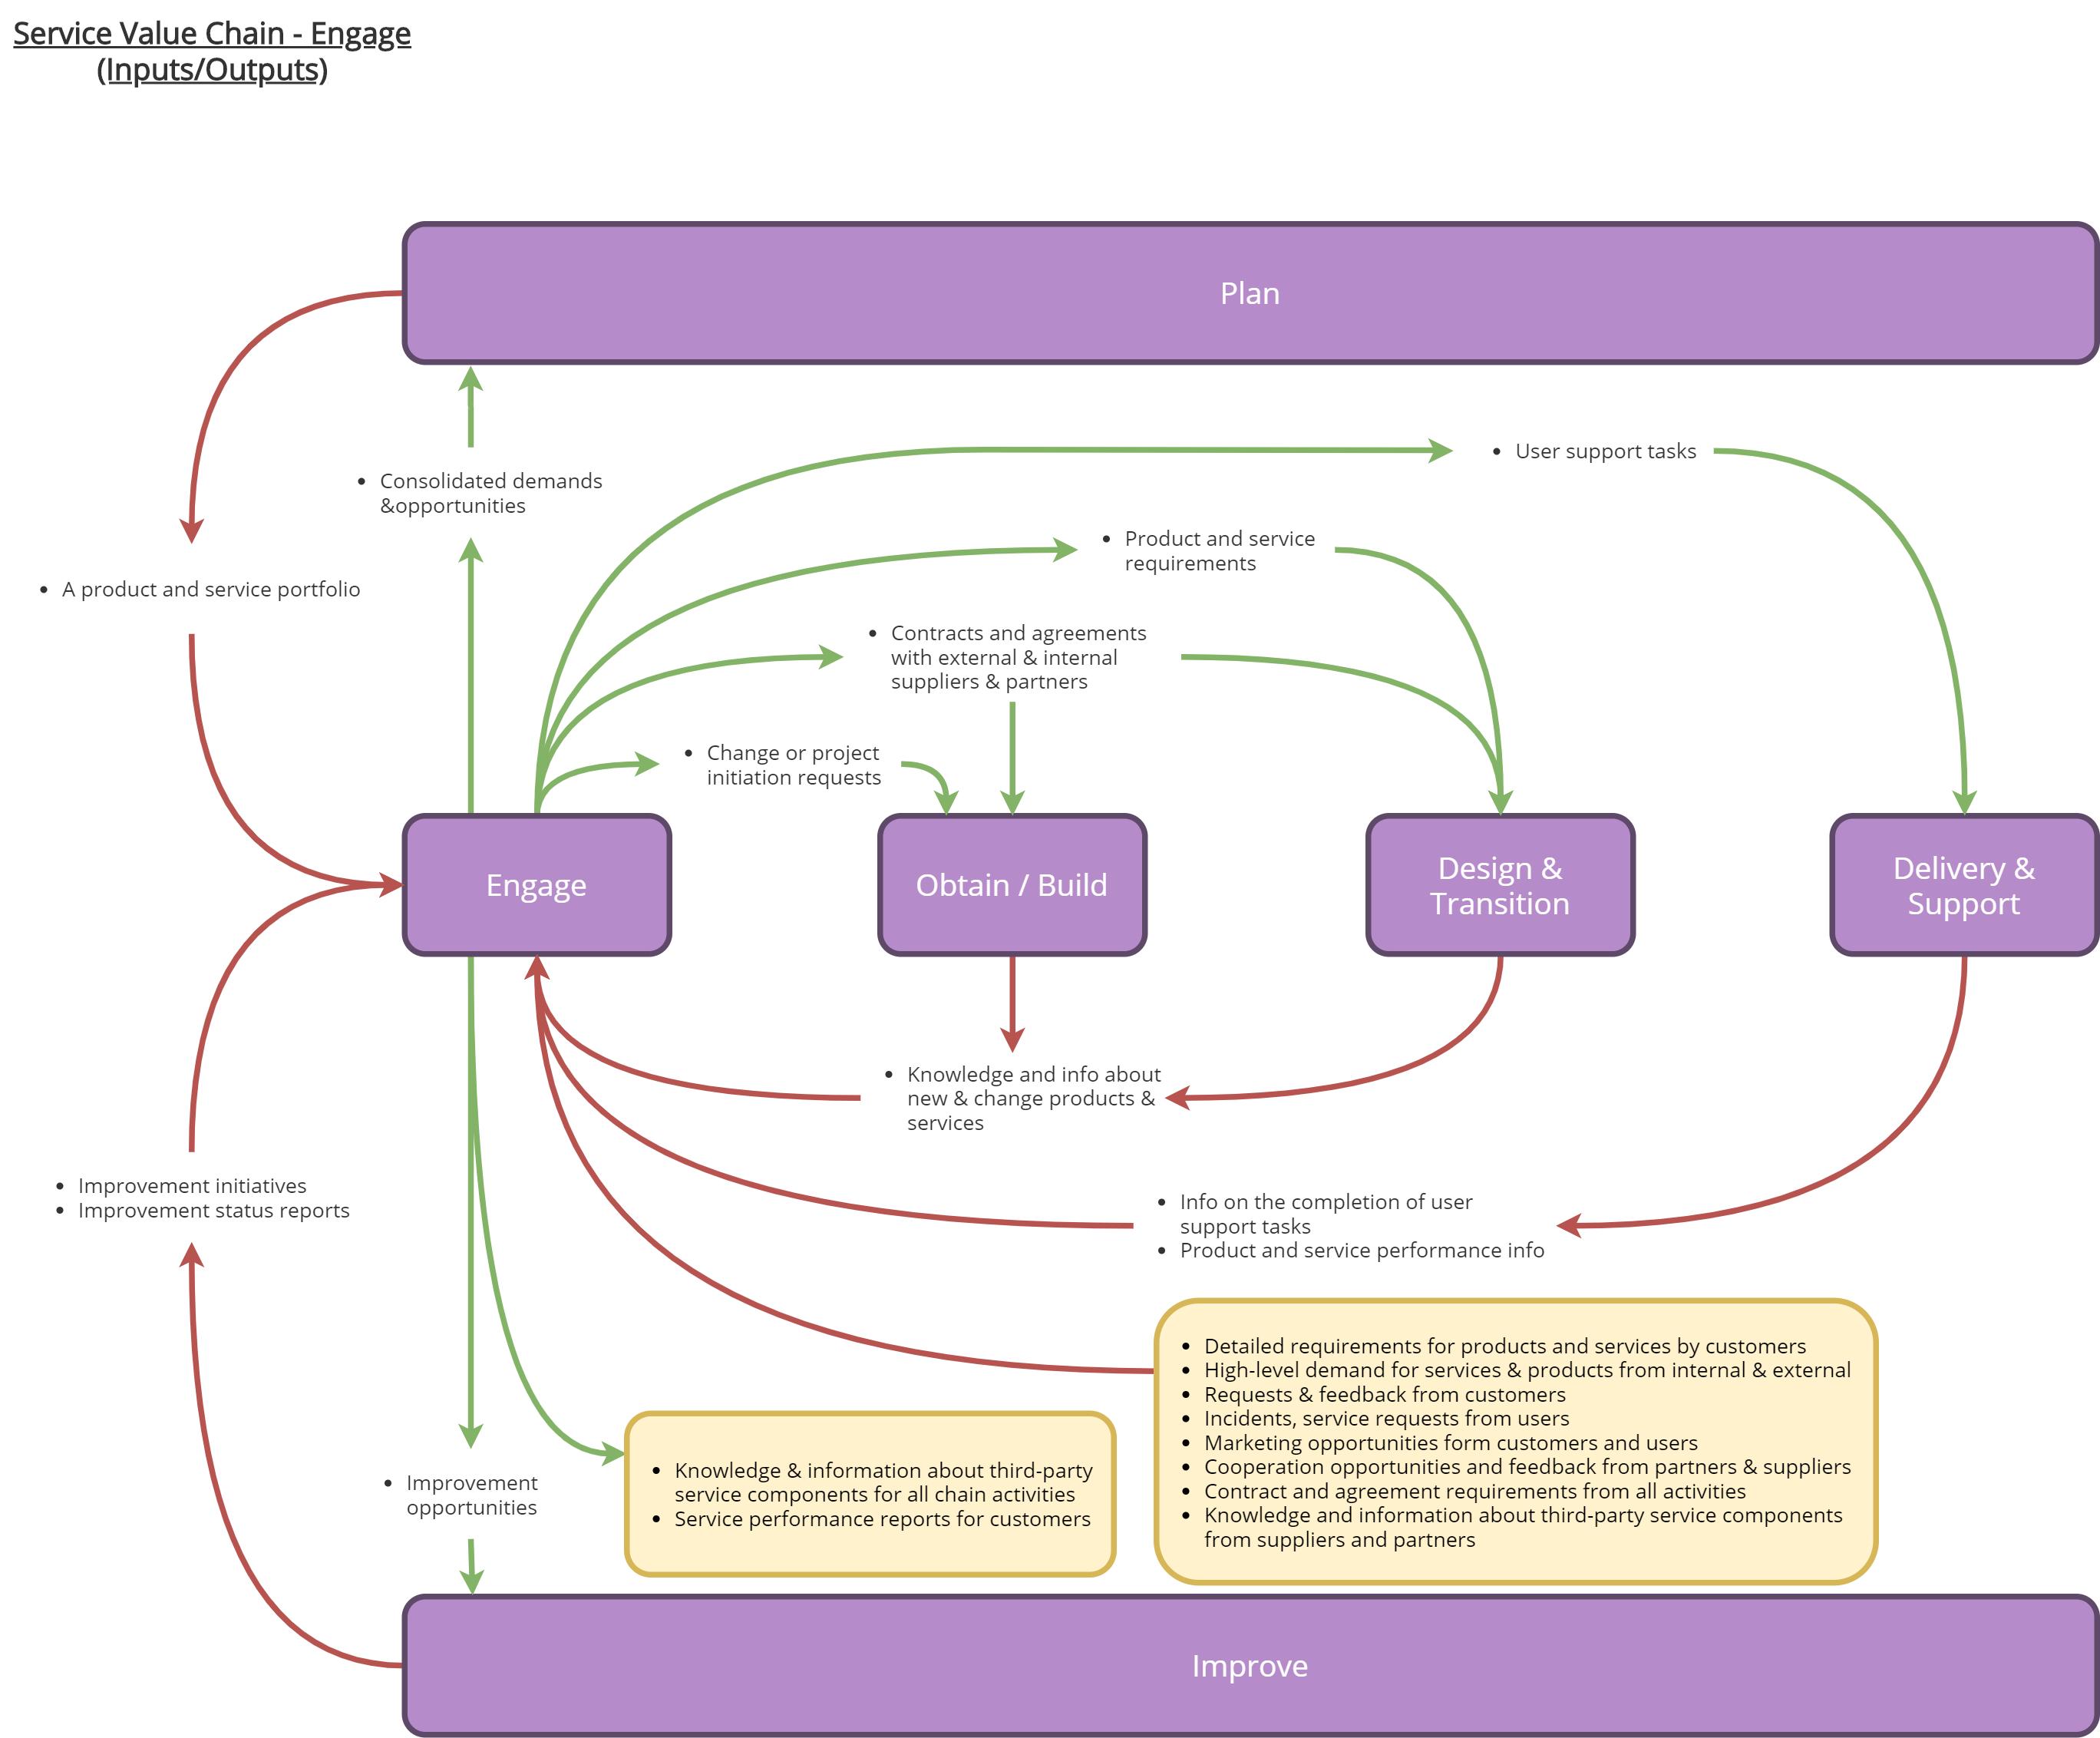 ServiceValueChainEngage – ITILv4